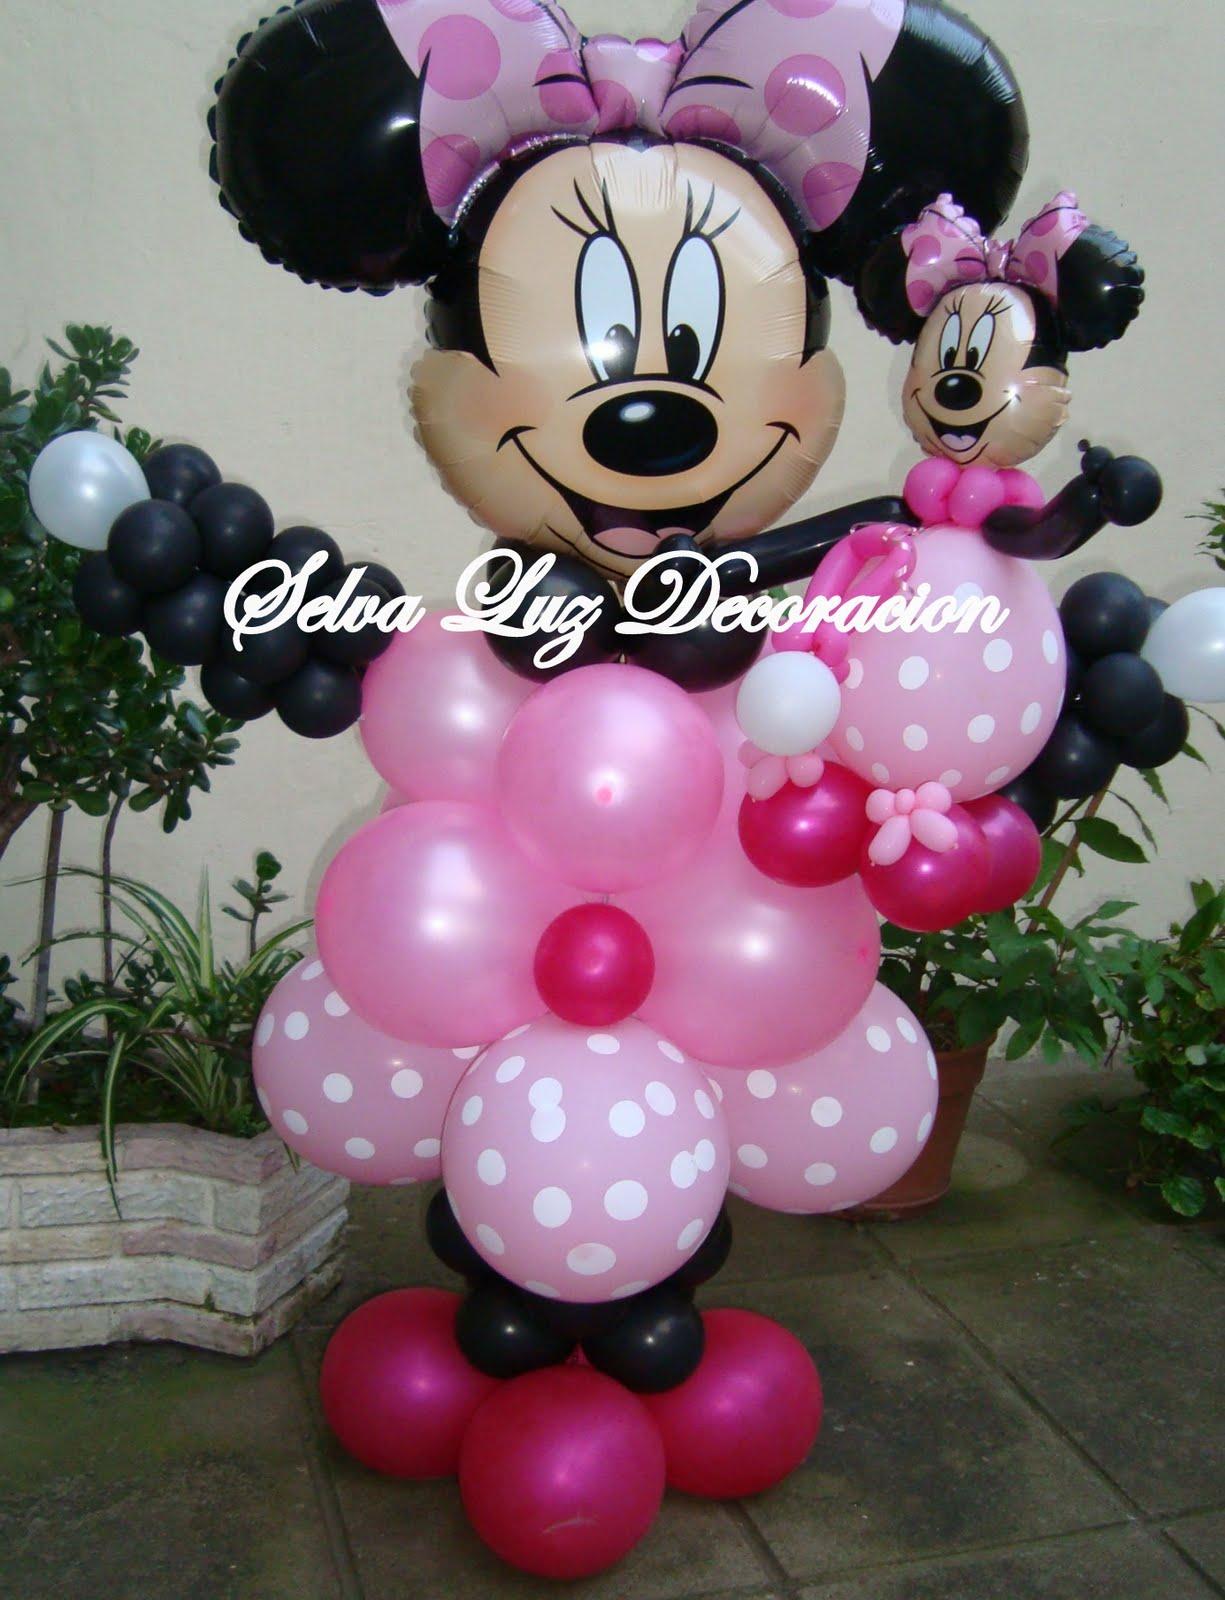 Decoracion Minnie Mouse ~ Decoracion De Fiestas De Minnie Mouse Wallpapers Real Madrid  Apps